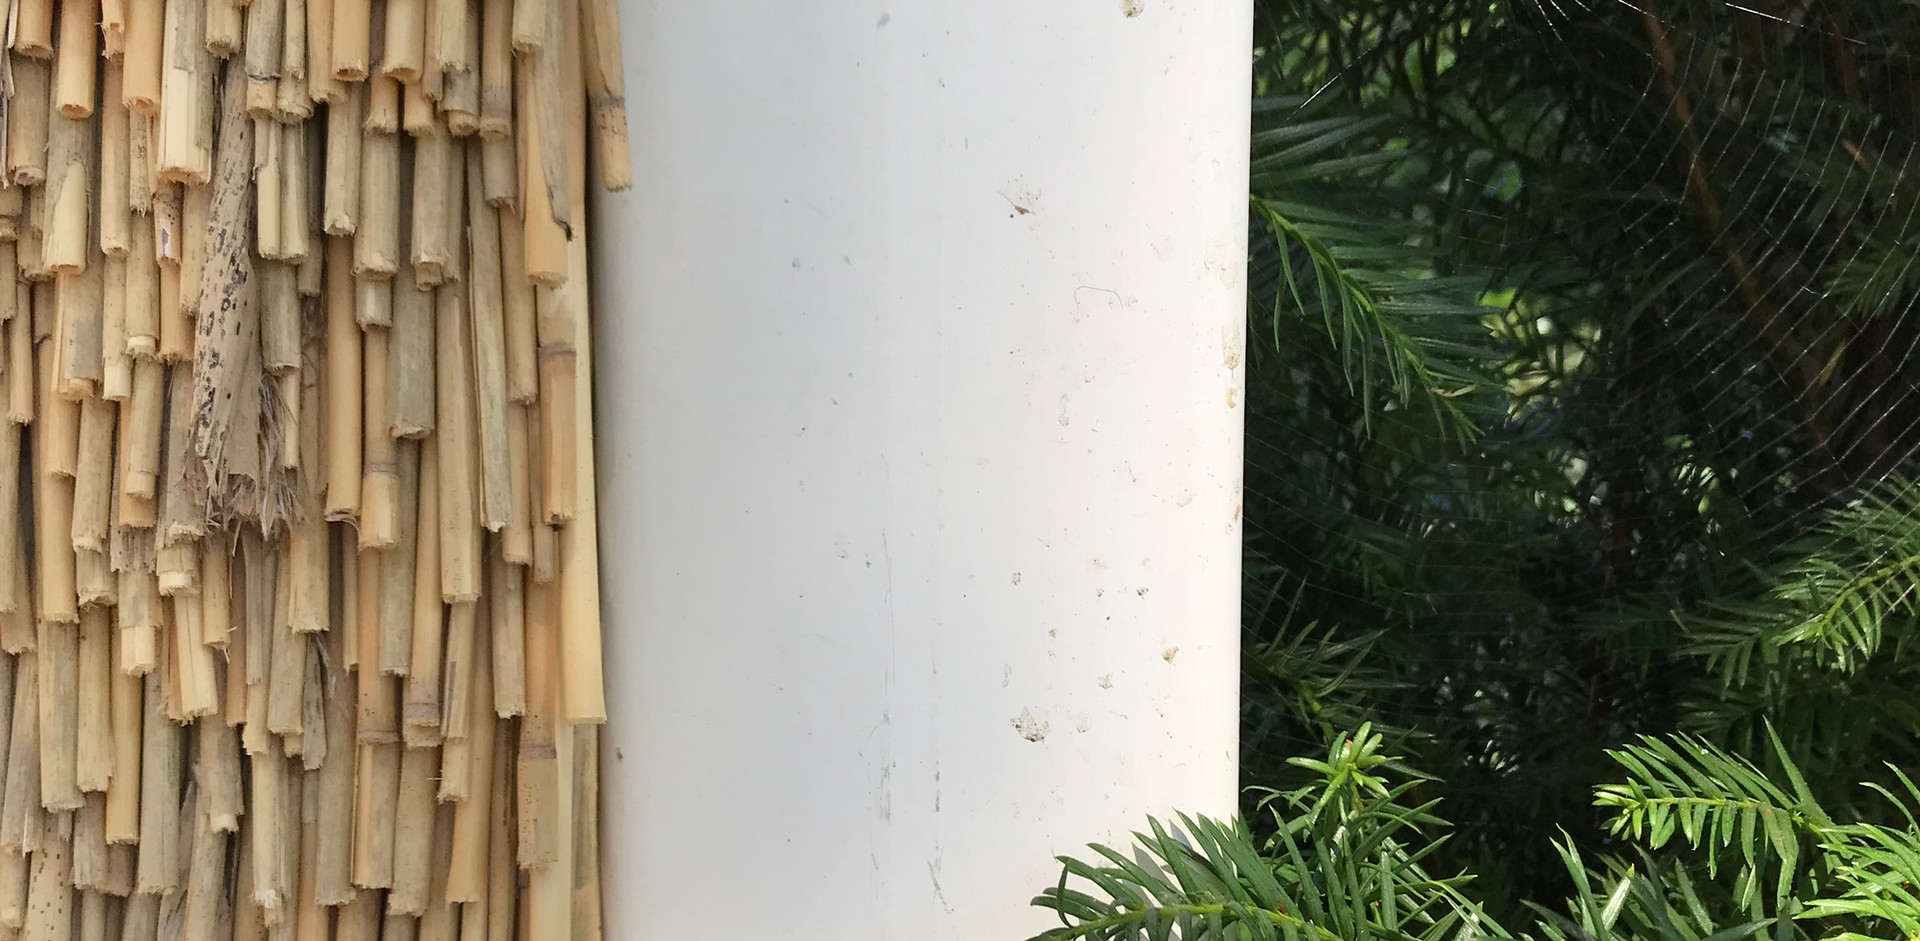 tuinmeubilair, tuinontwerp, van der rhee, outdoordesign